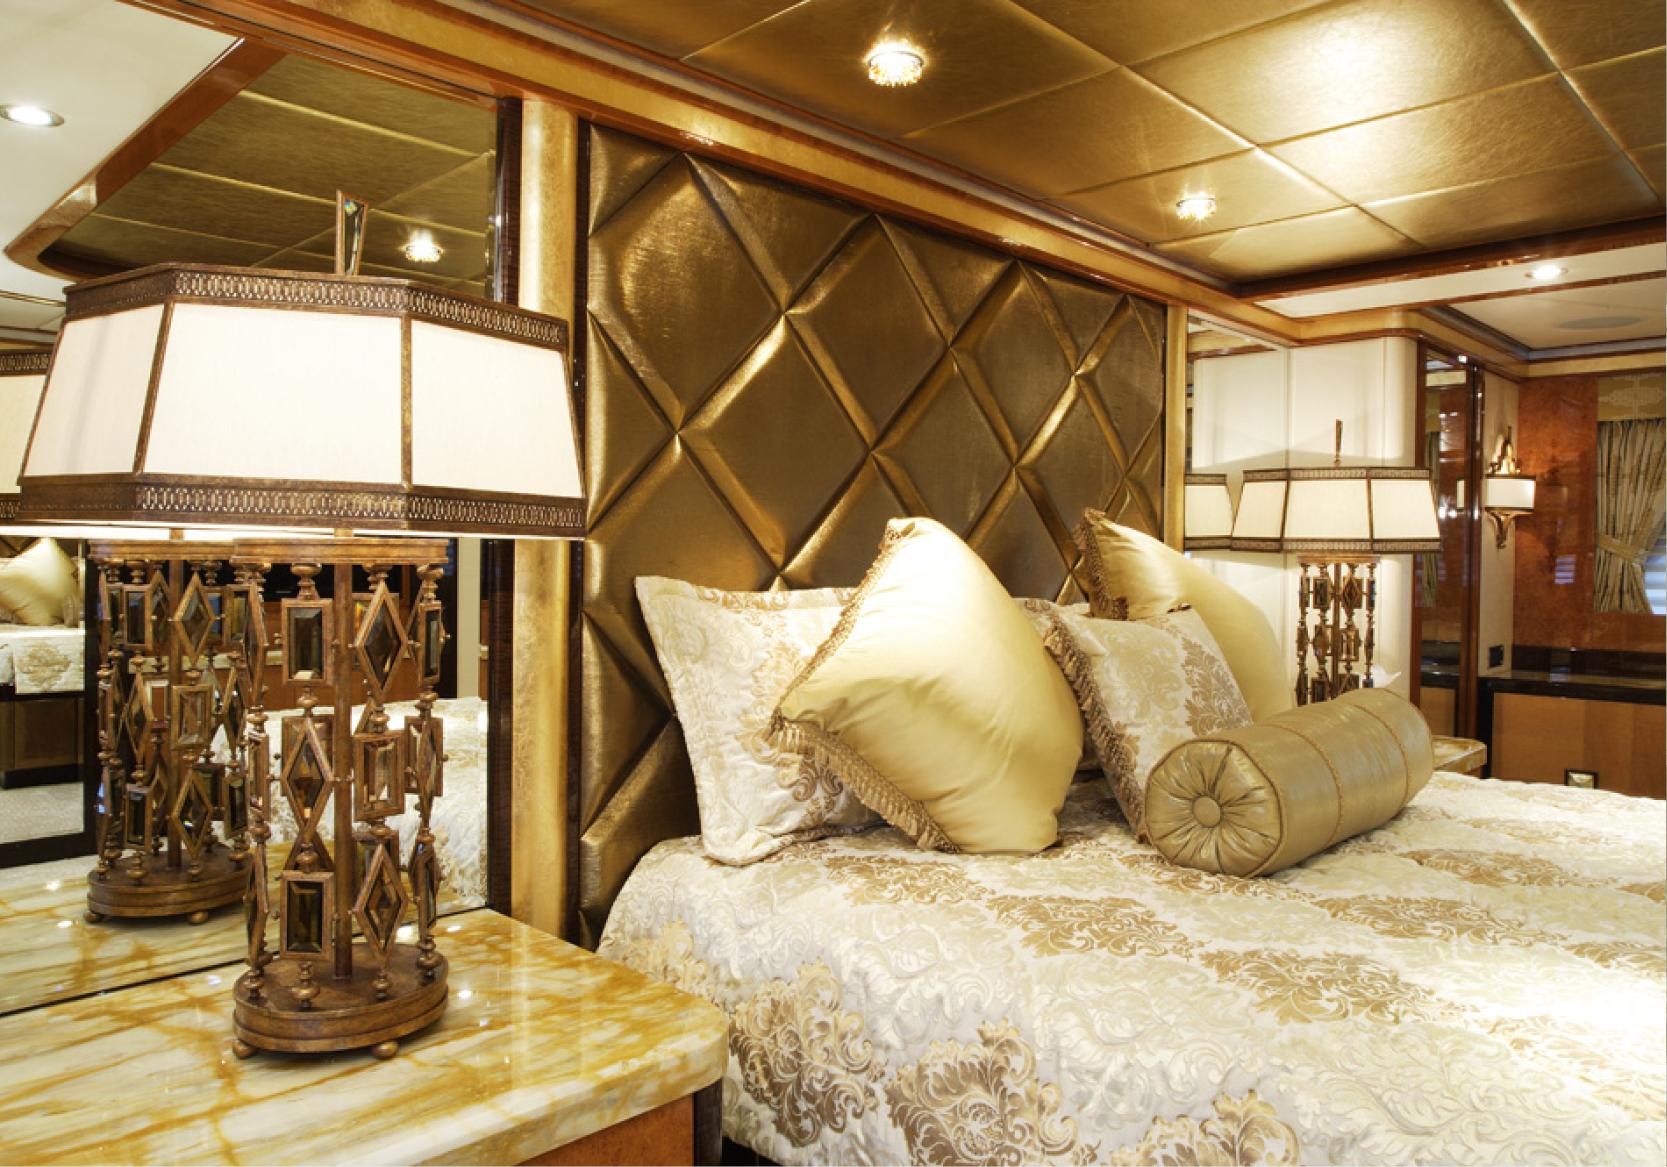 Karen-Lynn-Interior-Design-Yacht-Falcon-14.jpg